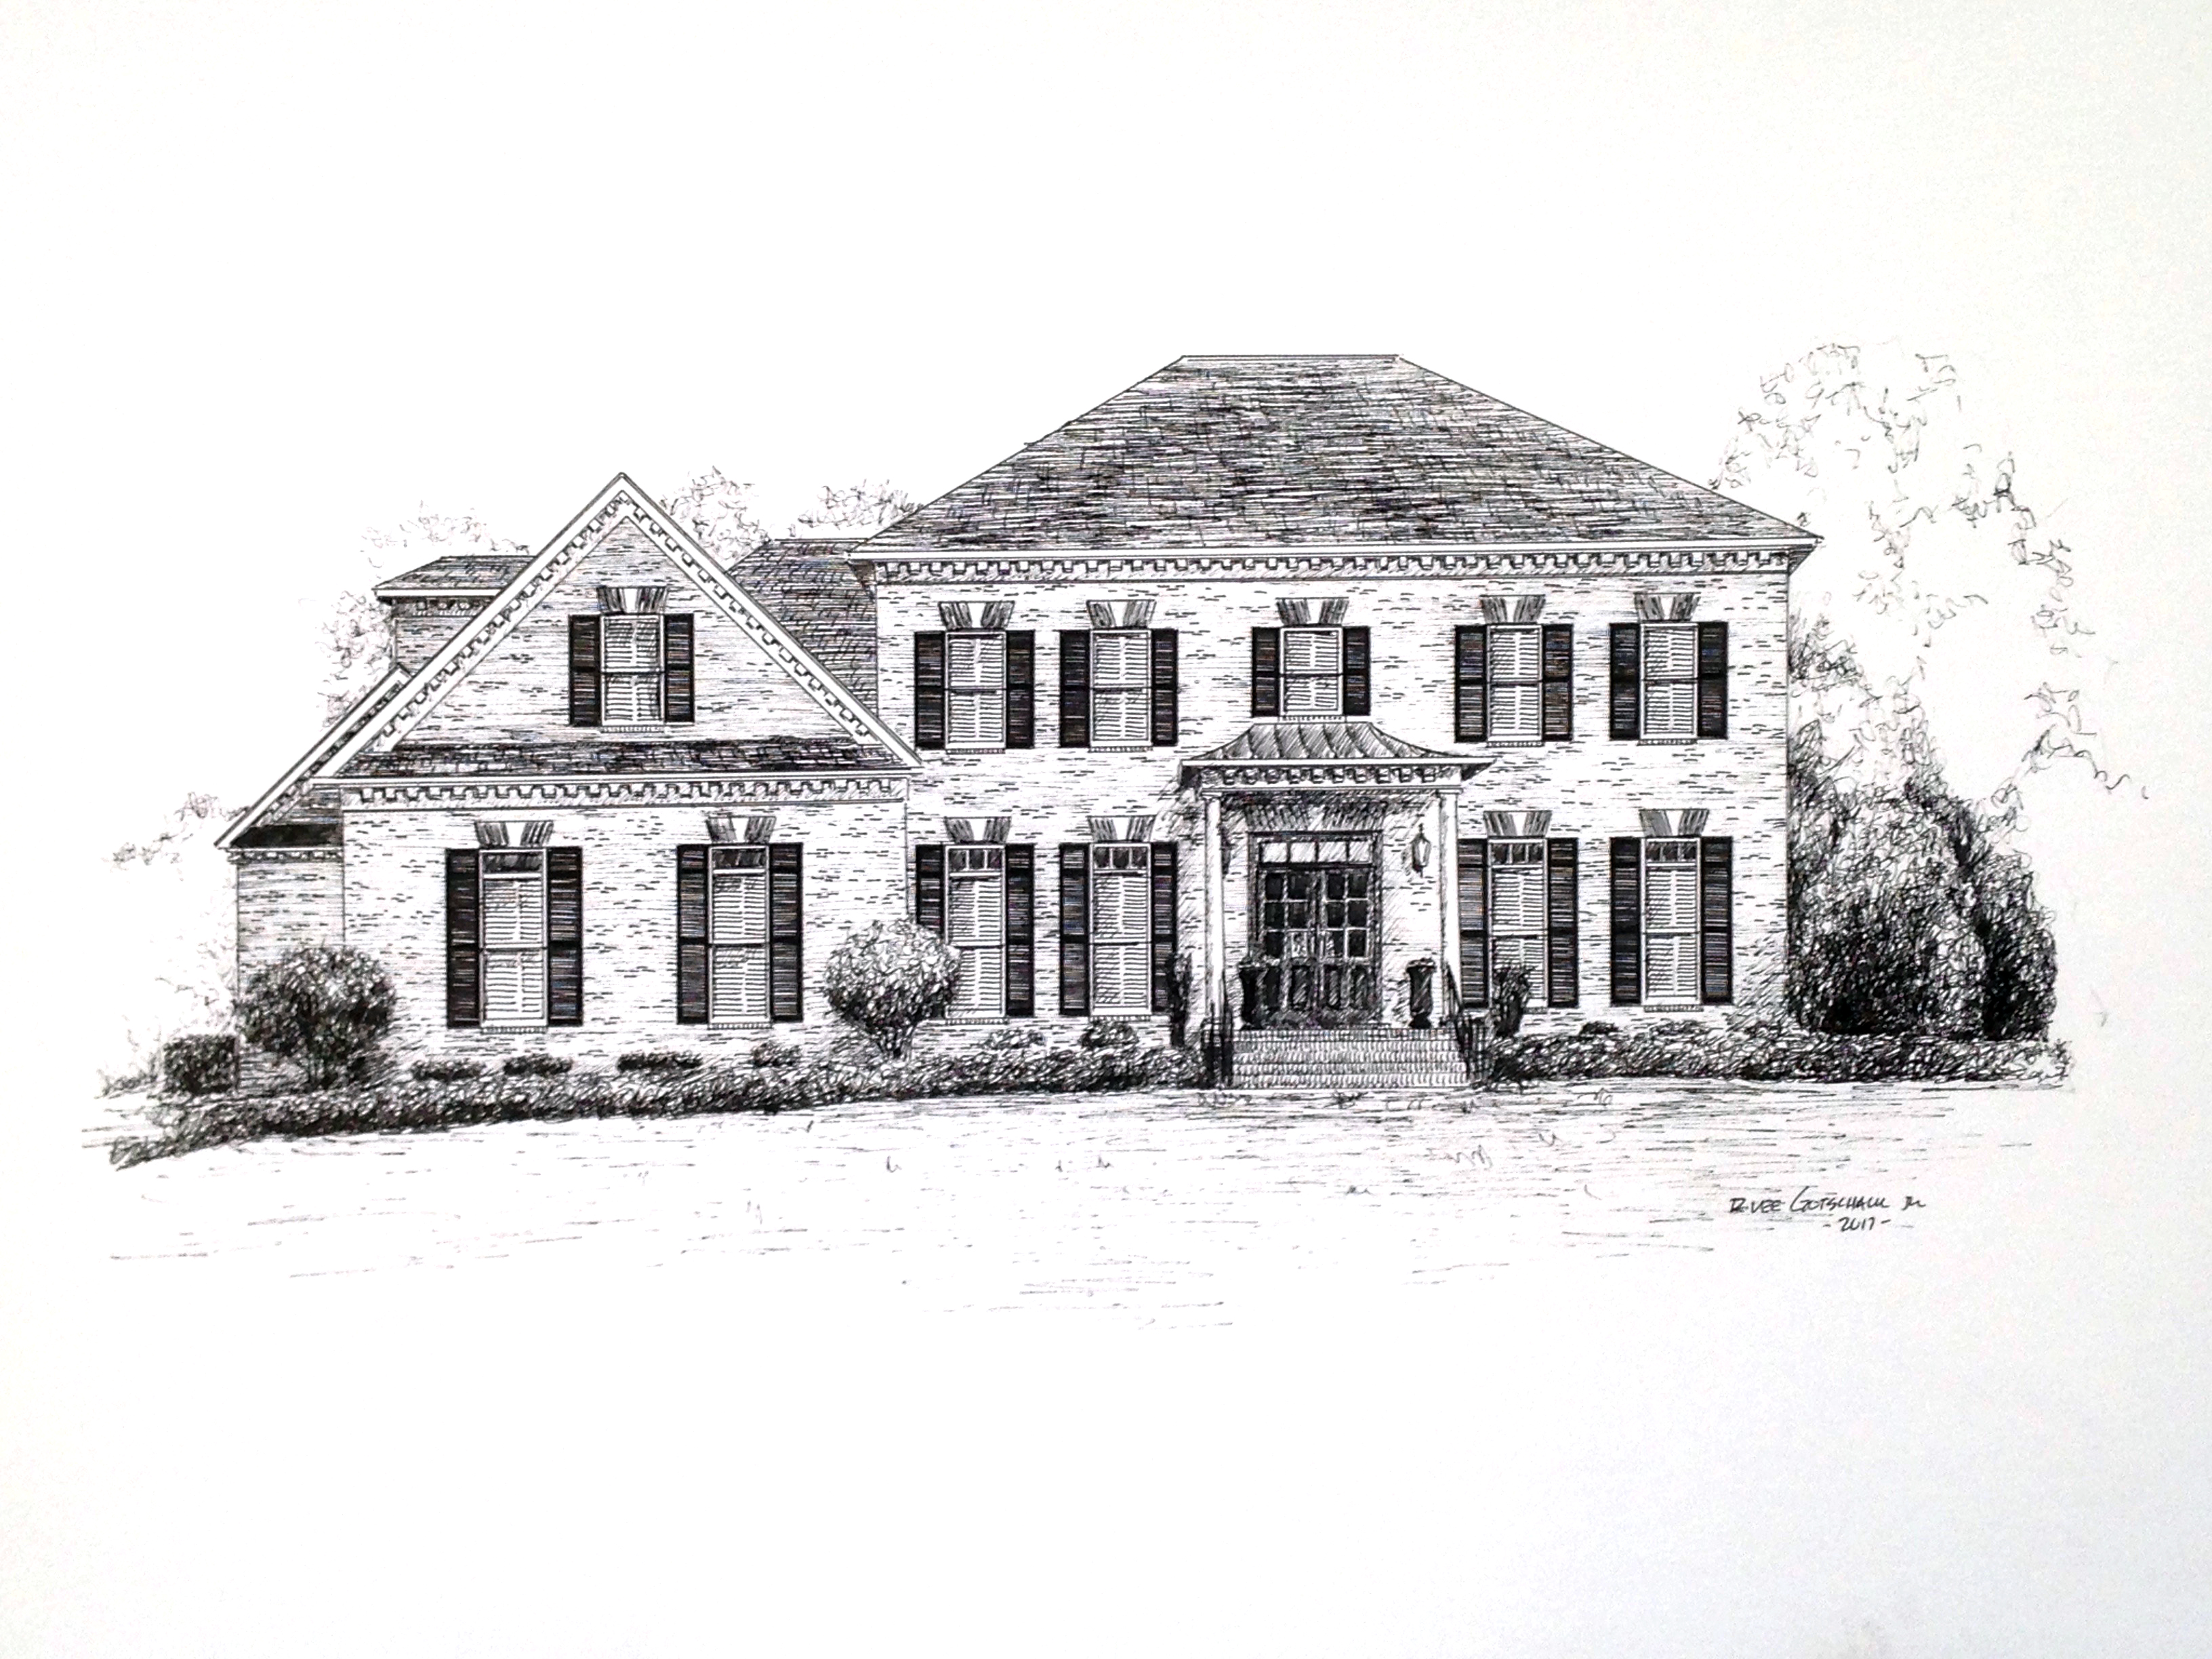 Erin's New House